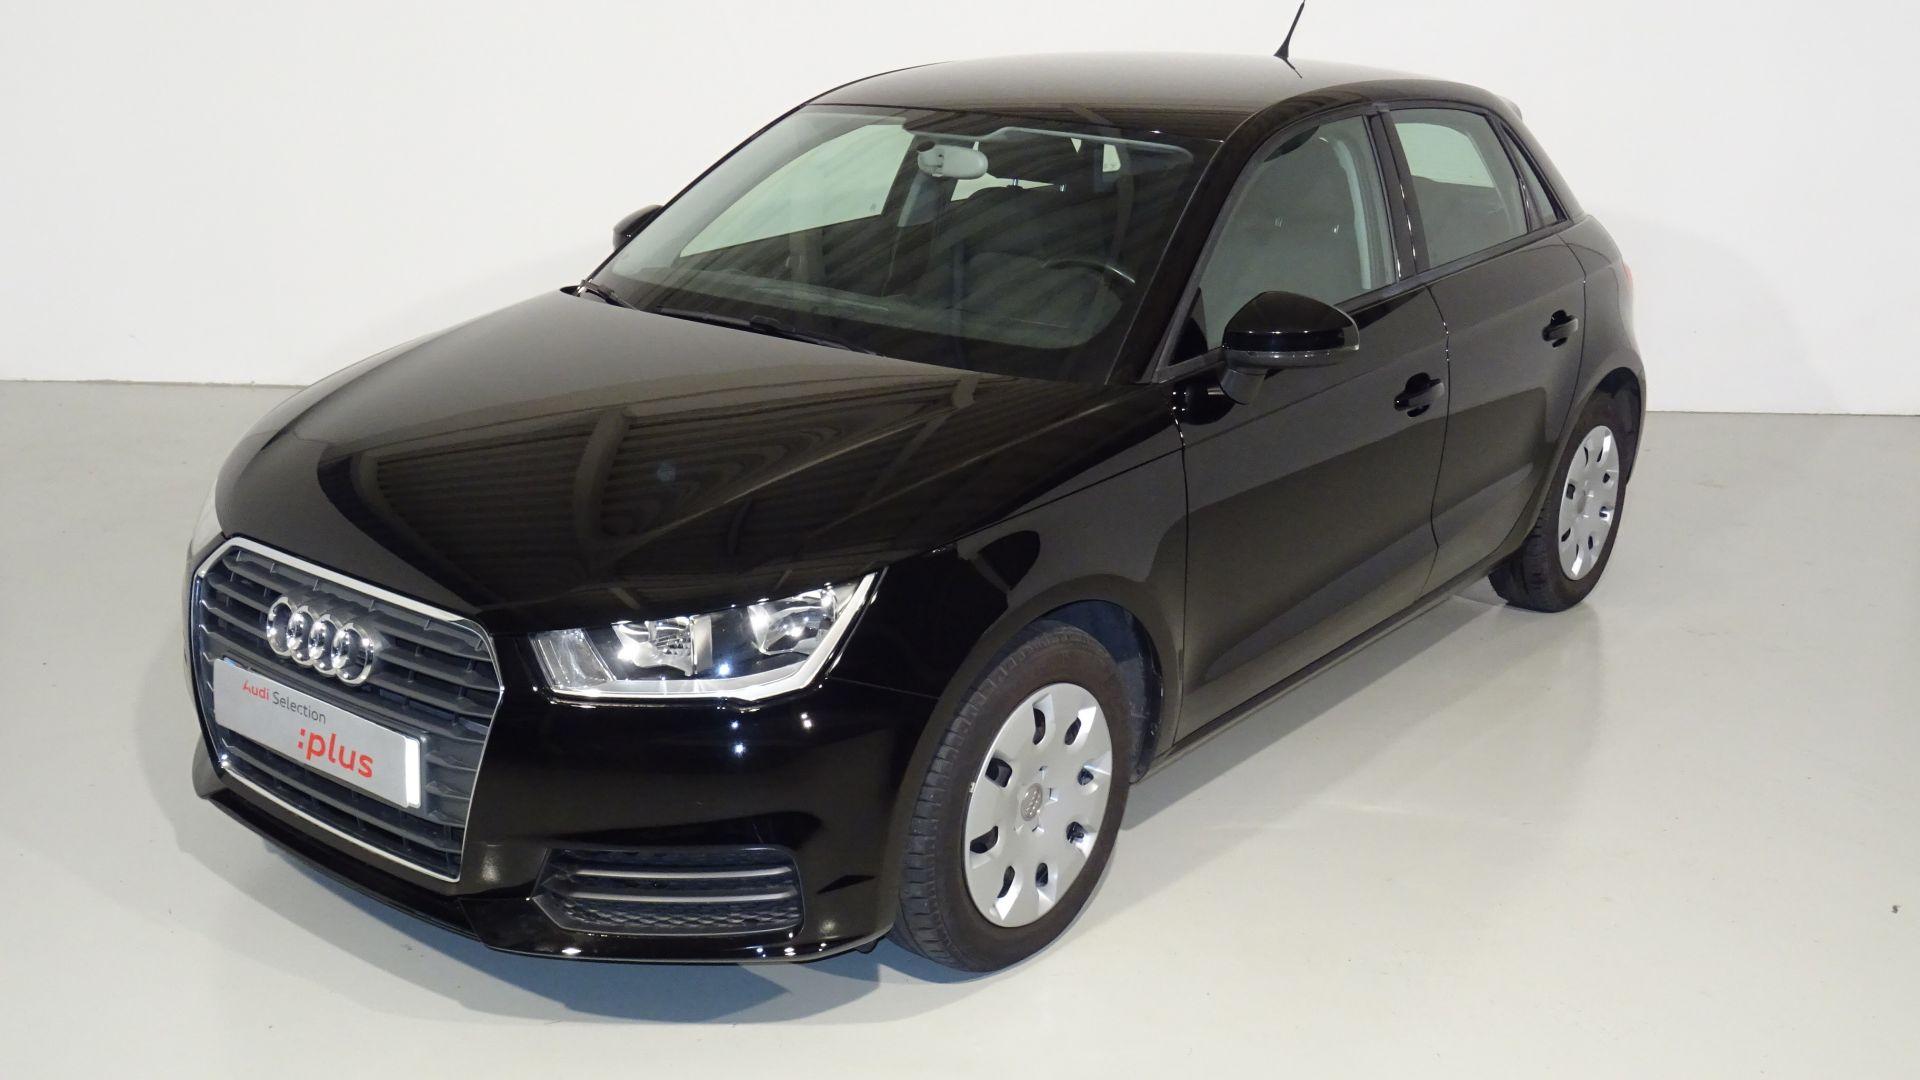 Audi A1 Sportback 1.4 TDI Attraction